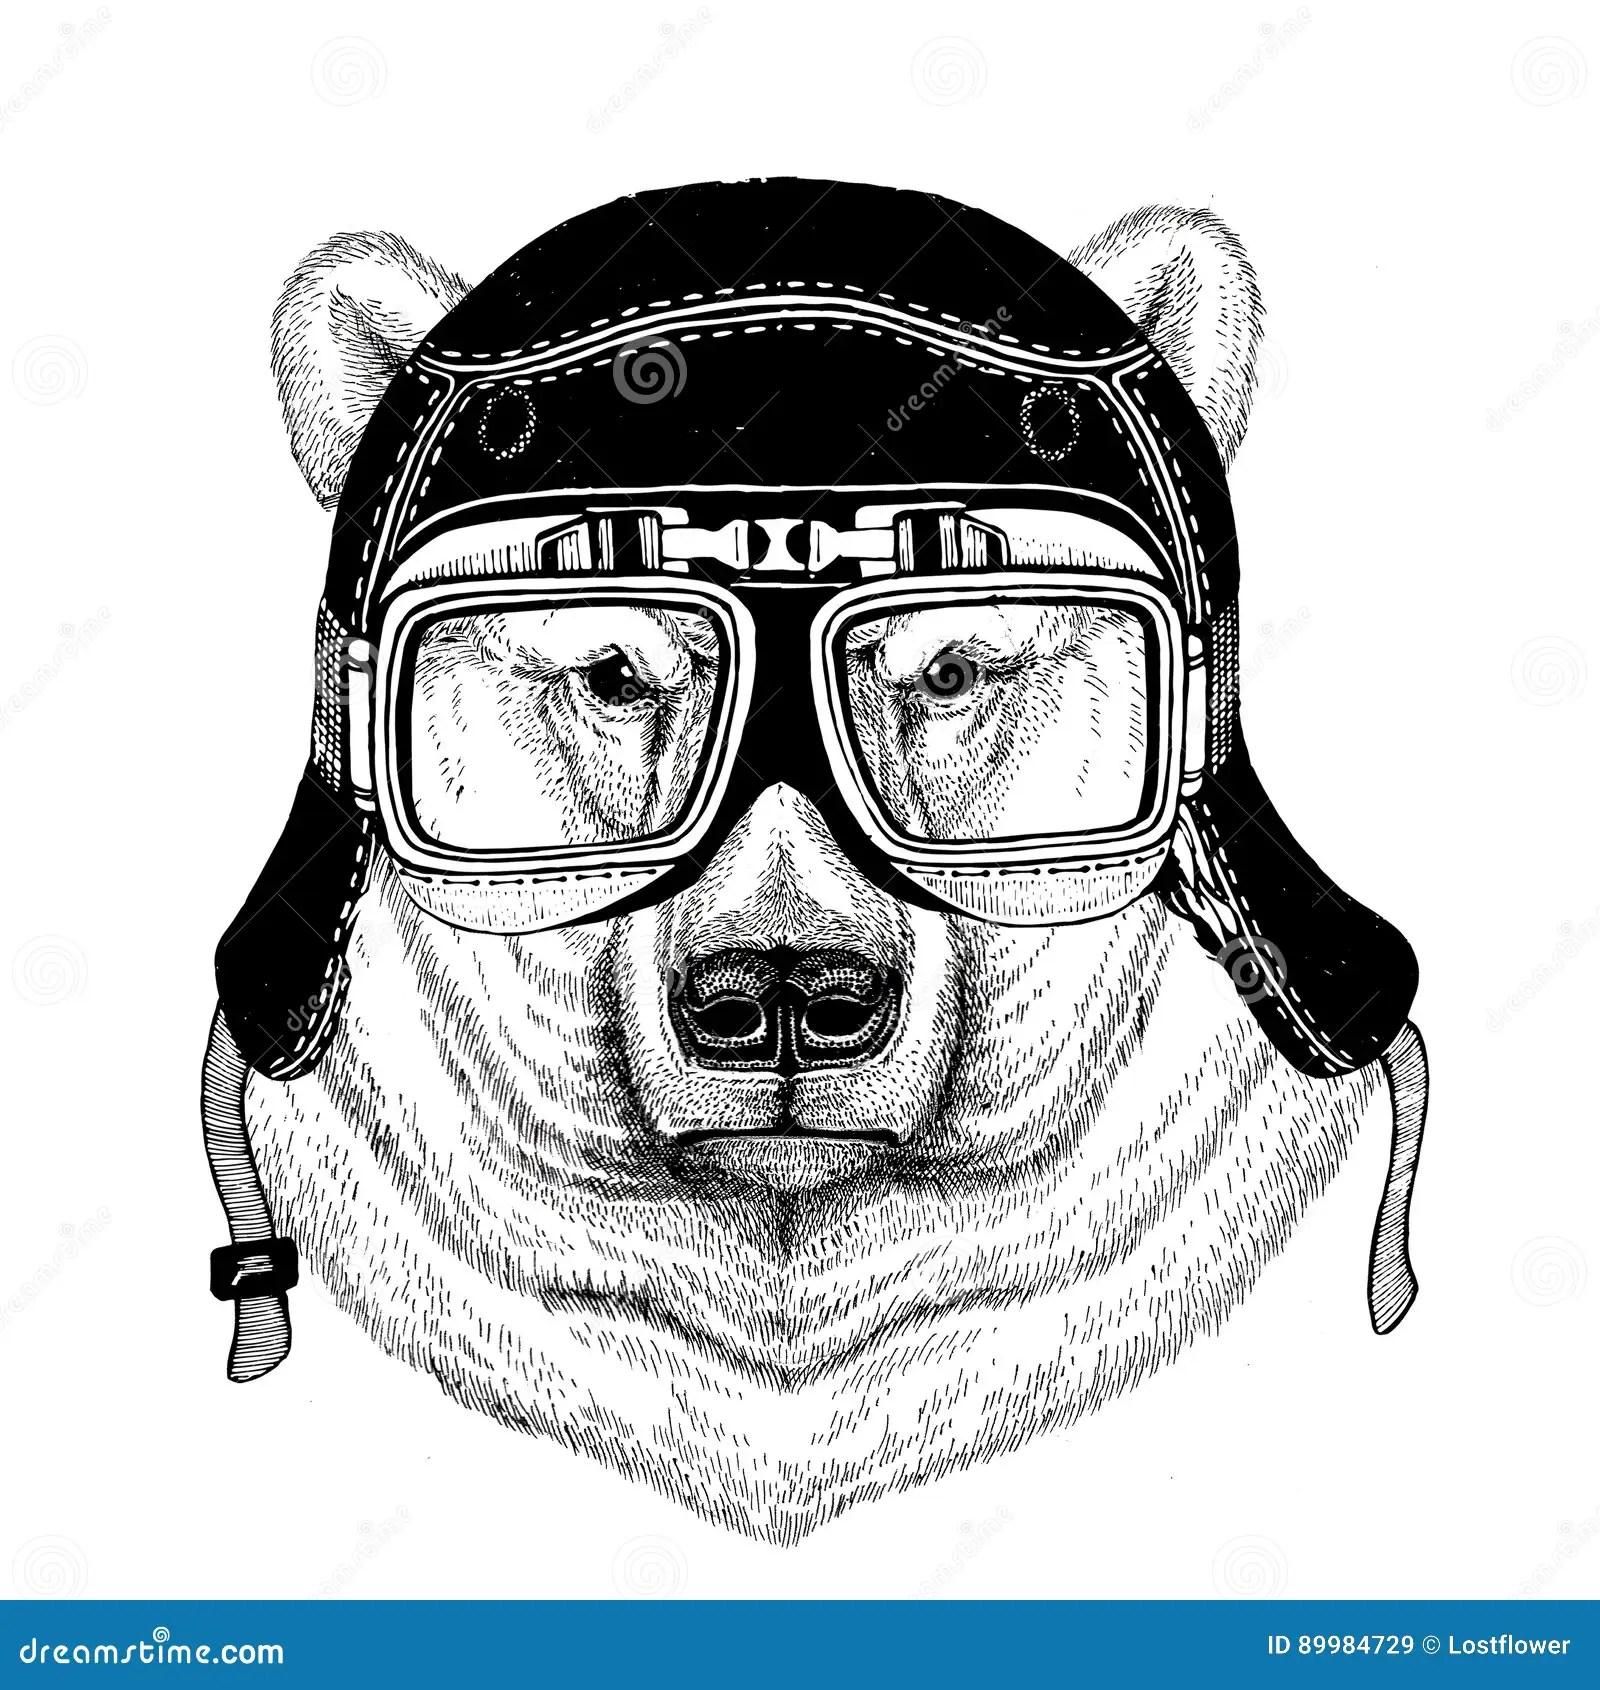 Vintage Images Of Dog For T Shirt Design For Motorcycle